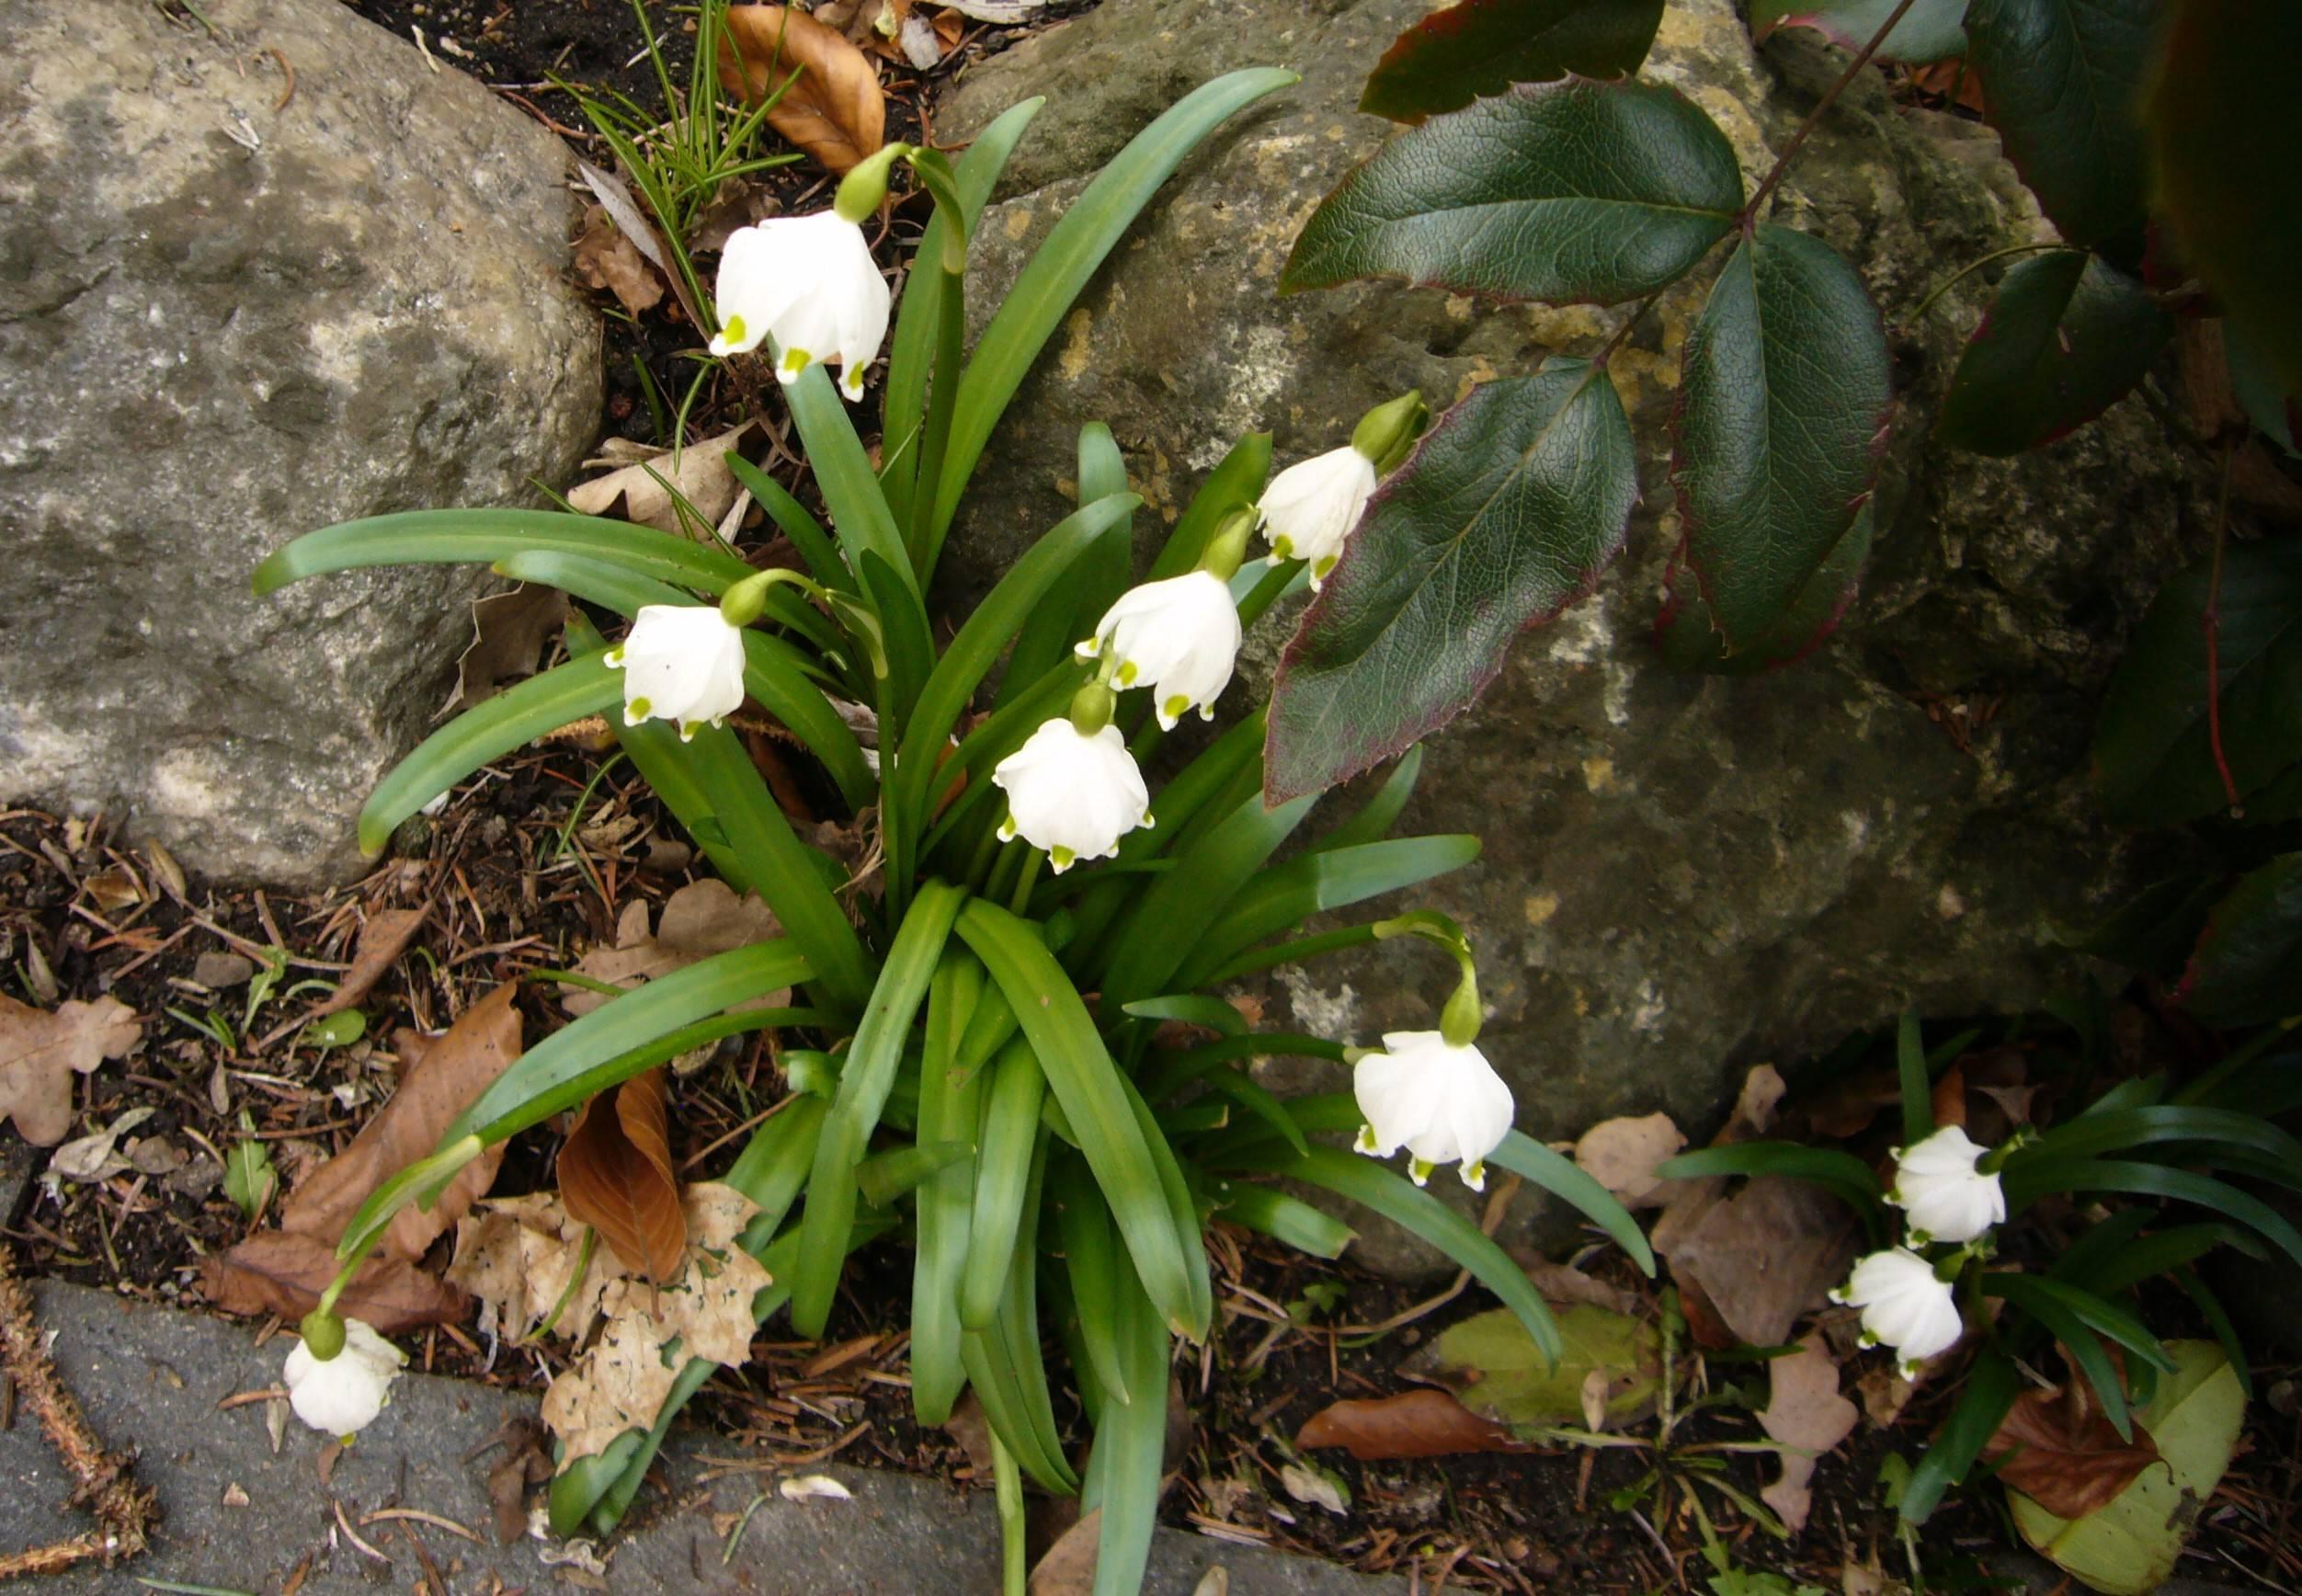 Naturschatz Knotenblumen – Leucojum